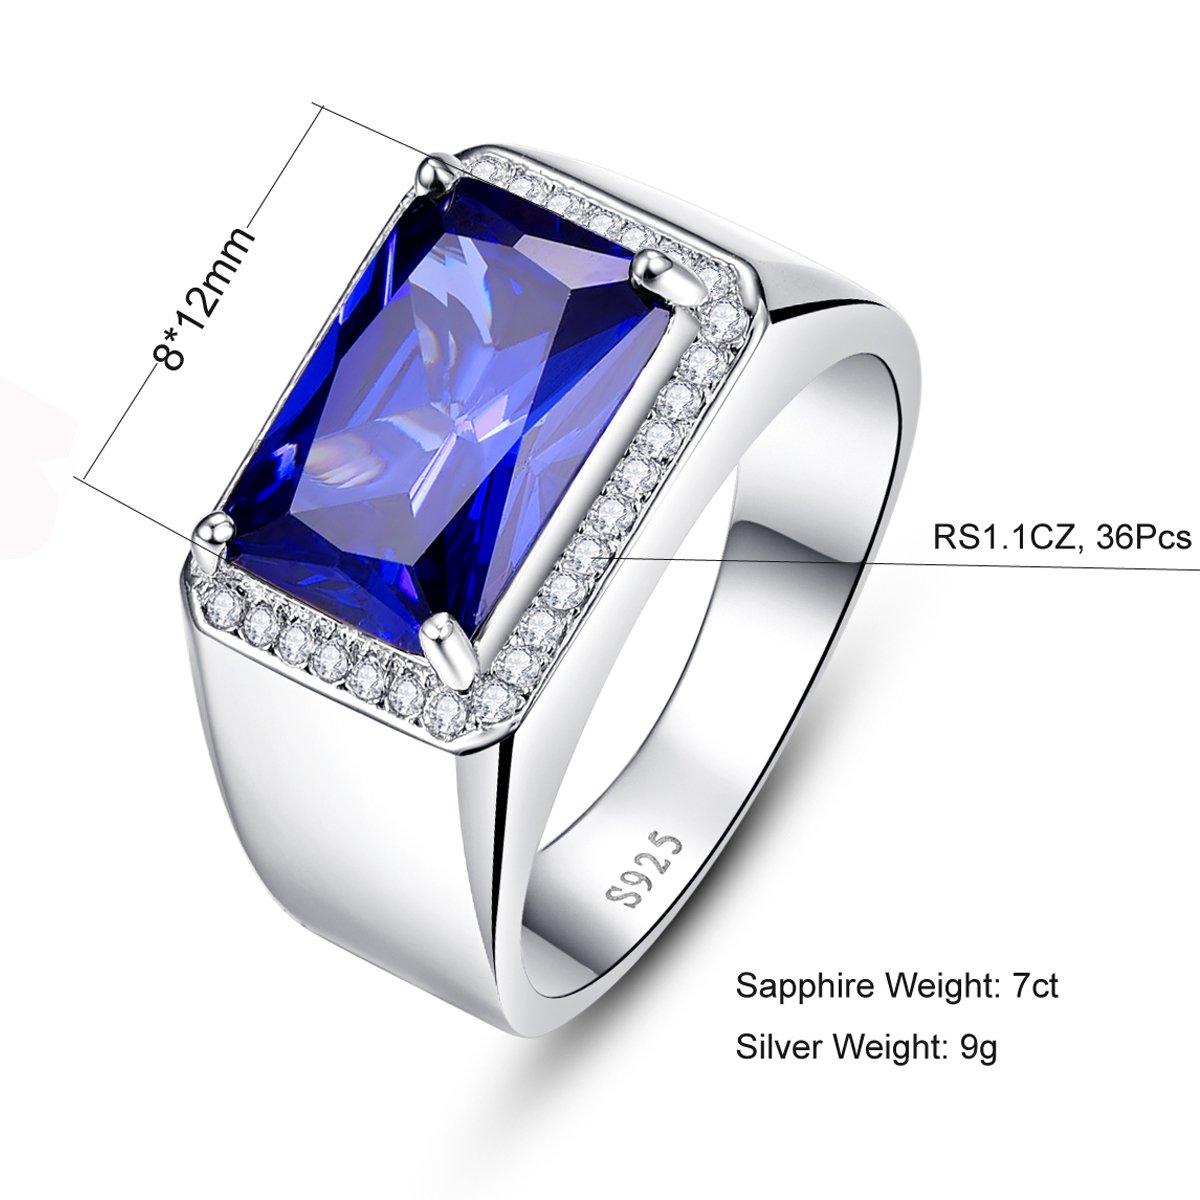 BONLAVIE 7.0ct Square Created Blue Sapphire 925 Sterling Silver Men's Ring Size 6 by BONLAVIE (Image #3)